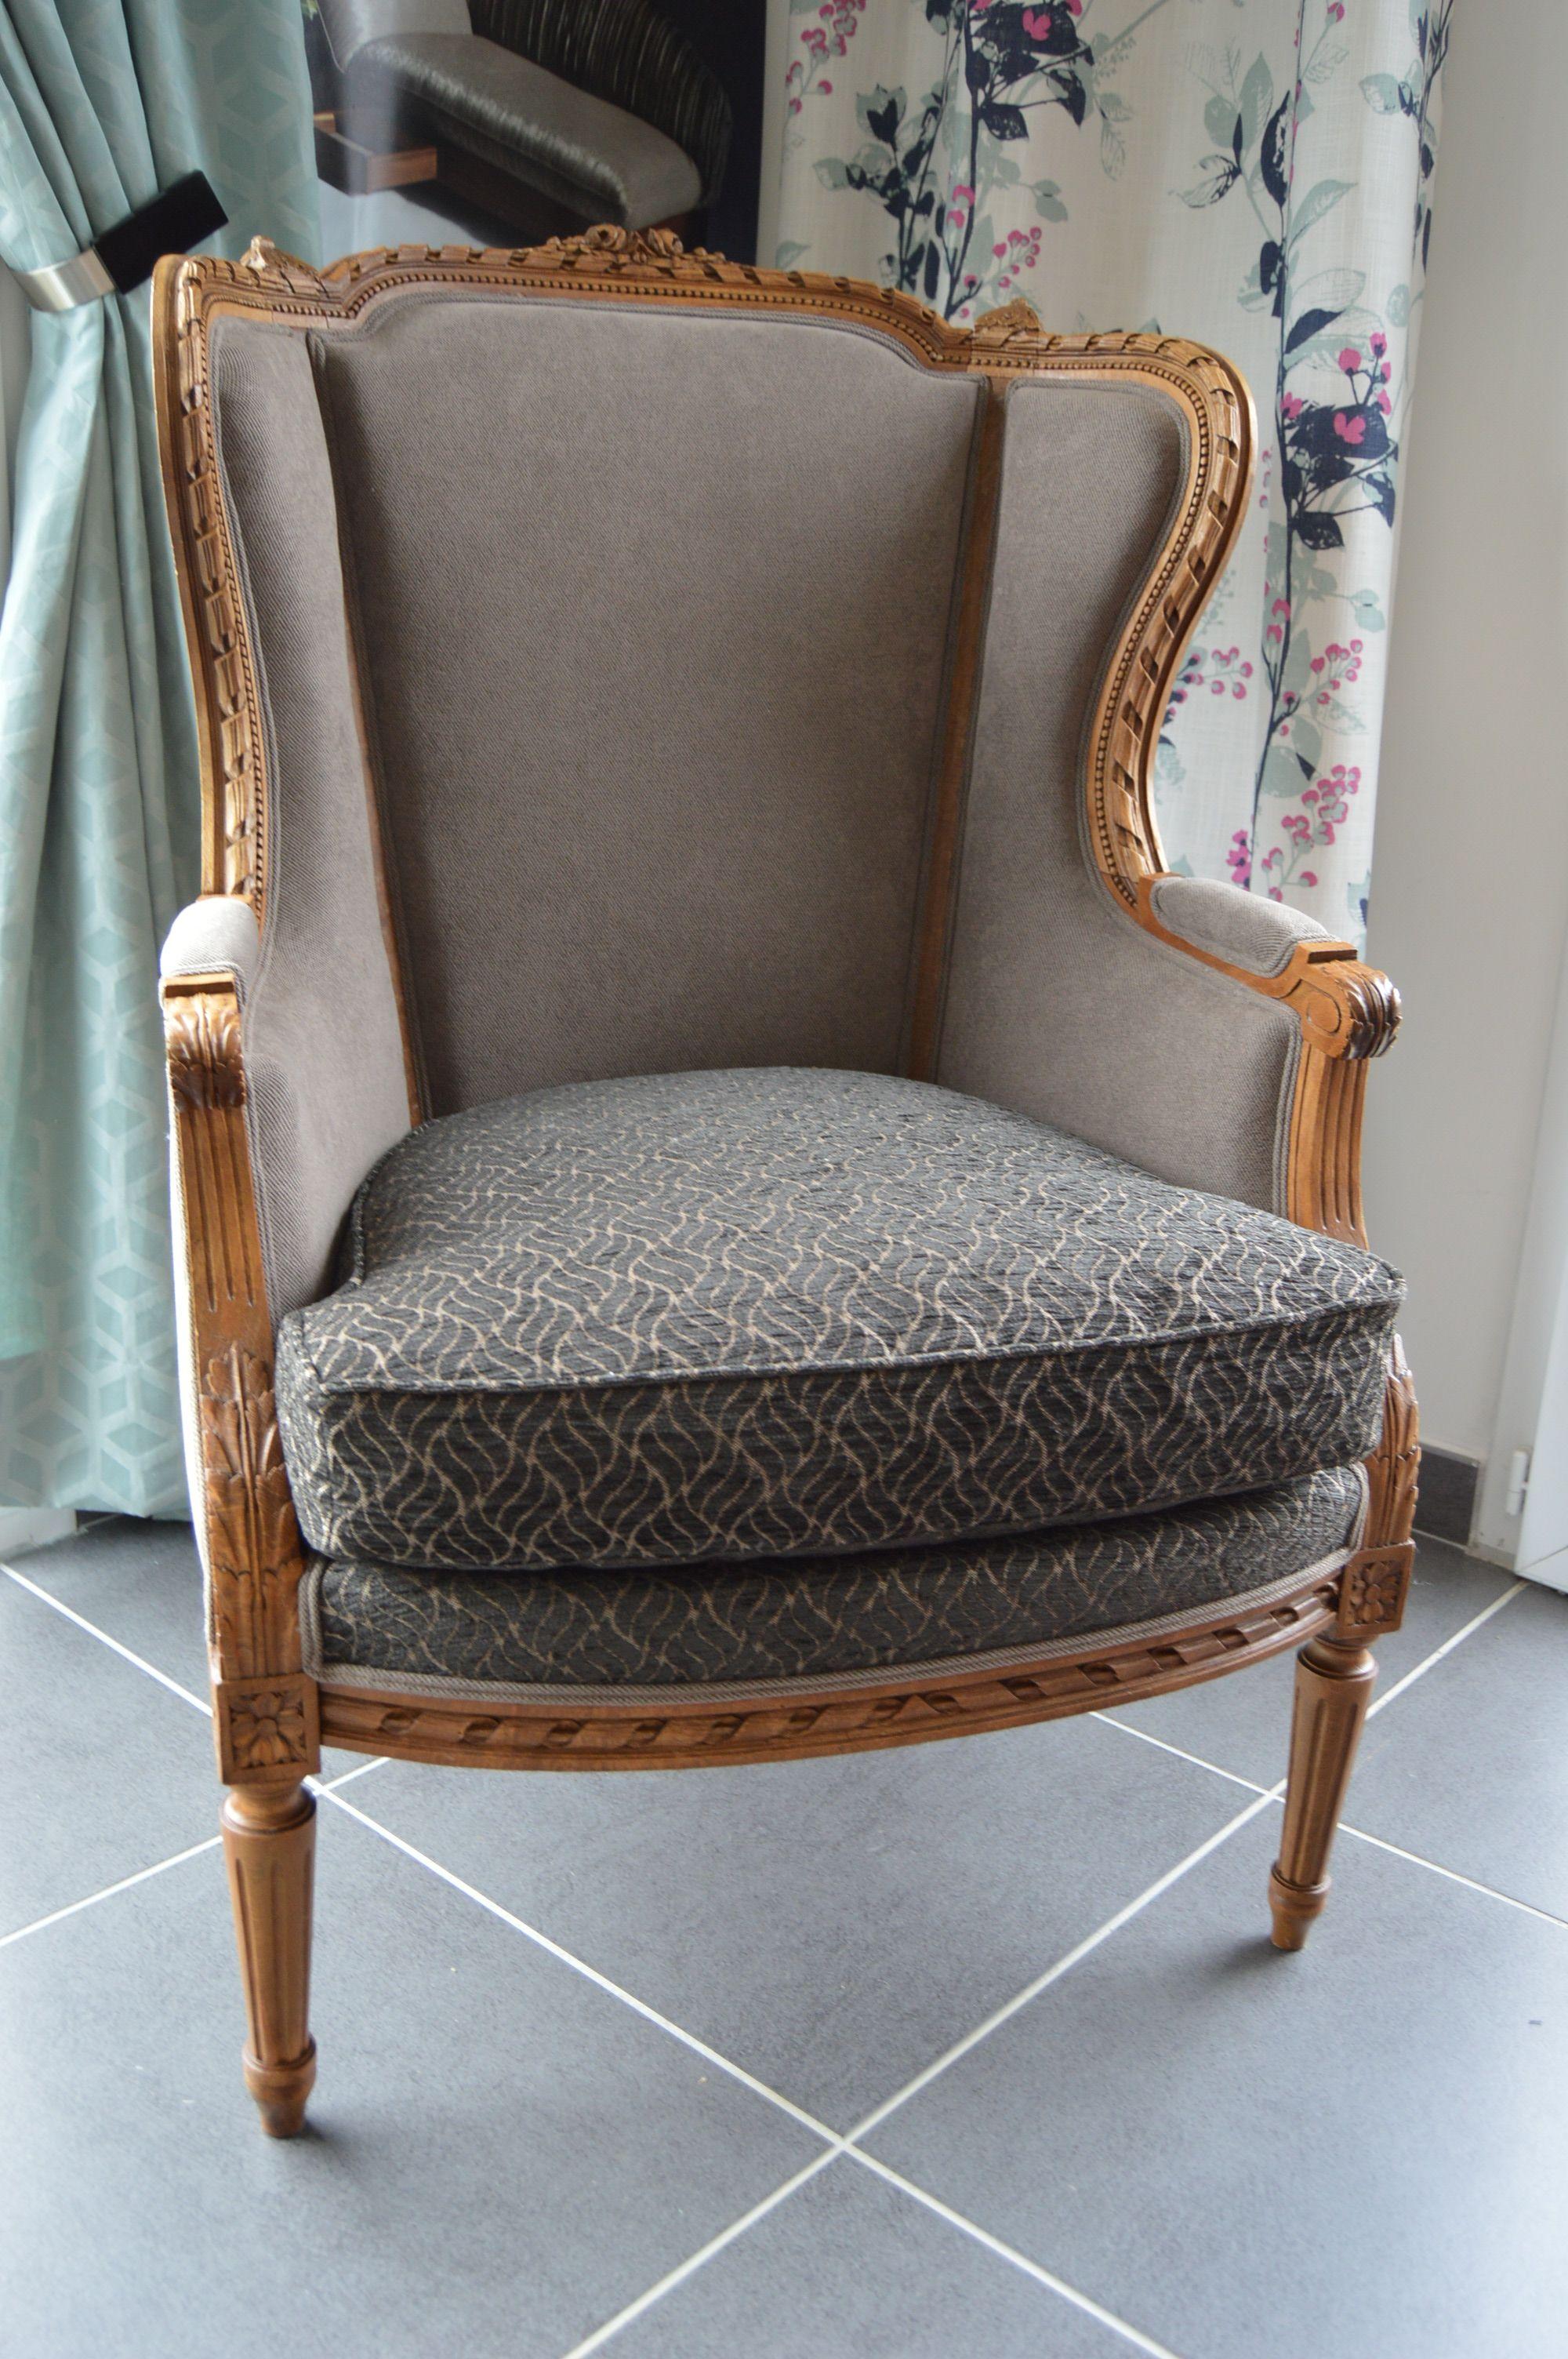 Bergere Louis Xvi Home Decor Decor Accent Chairs